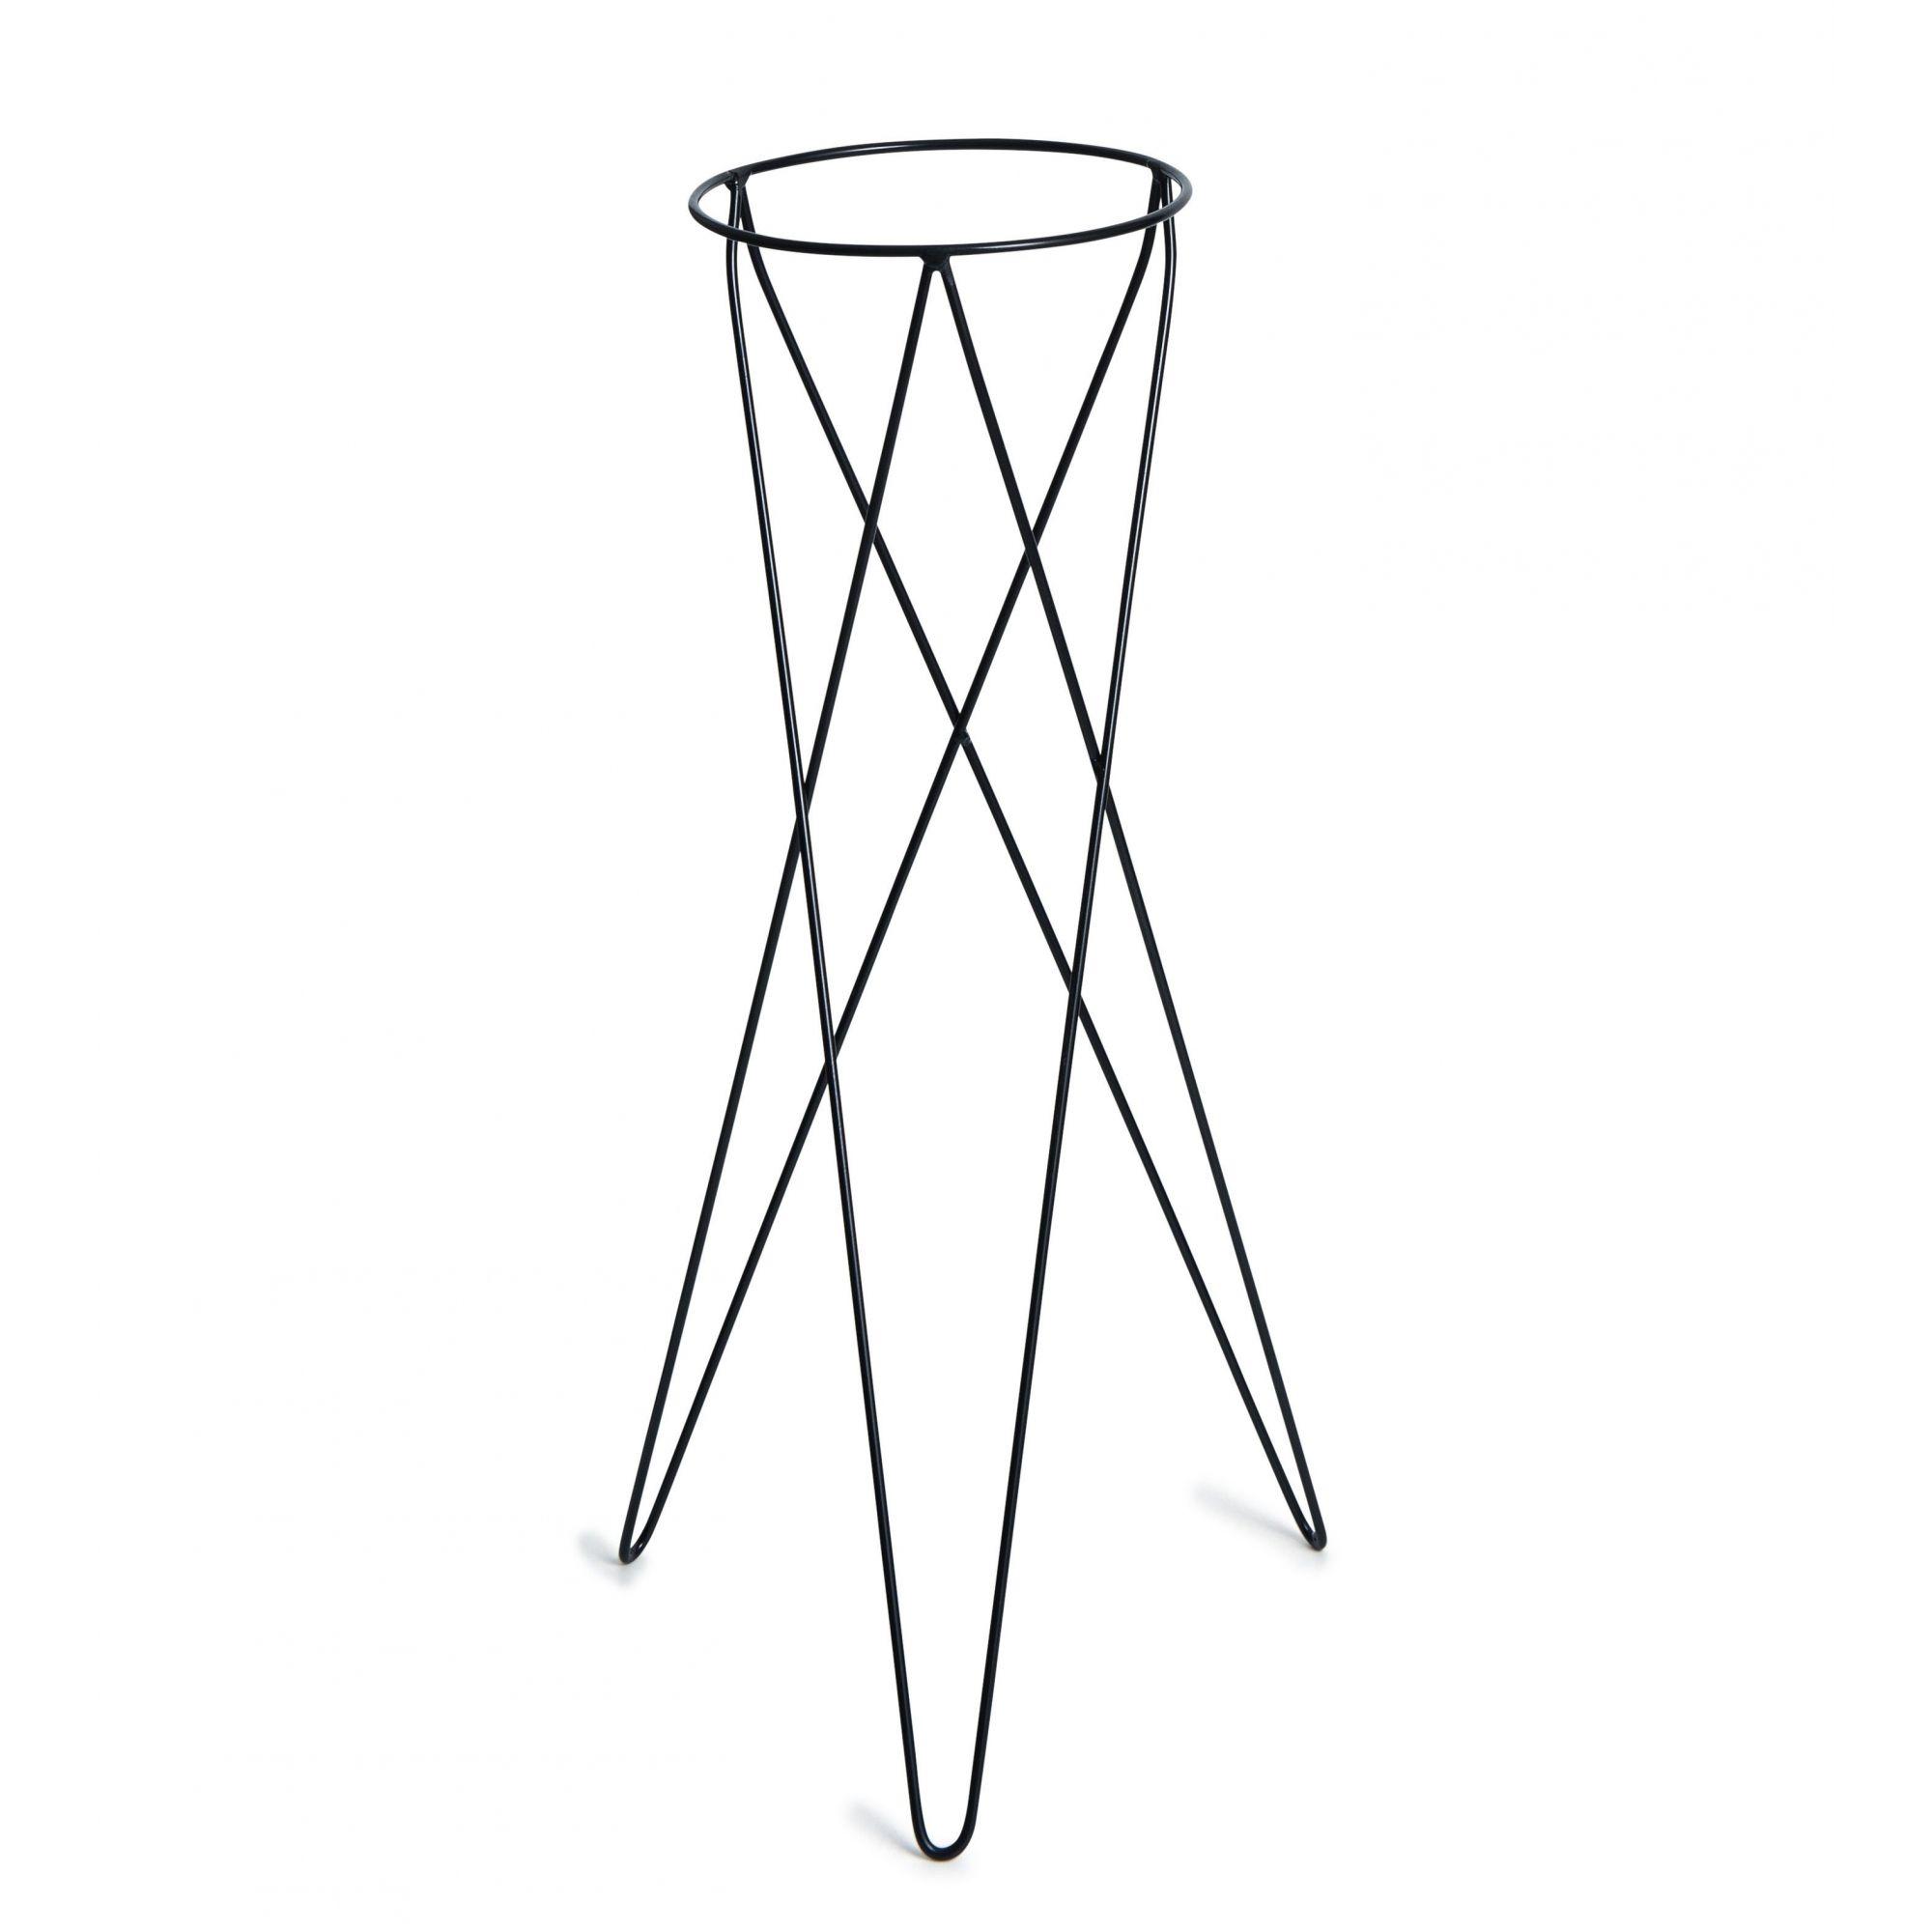 Suporte Tripé Metálico Preto 60cm para Vaso Autoirrigável Grande N04 Raiz  - Vasos Raiz Loja Oficial